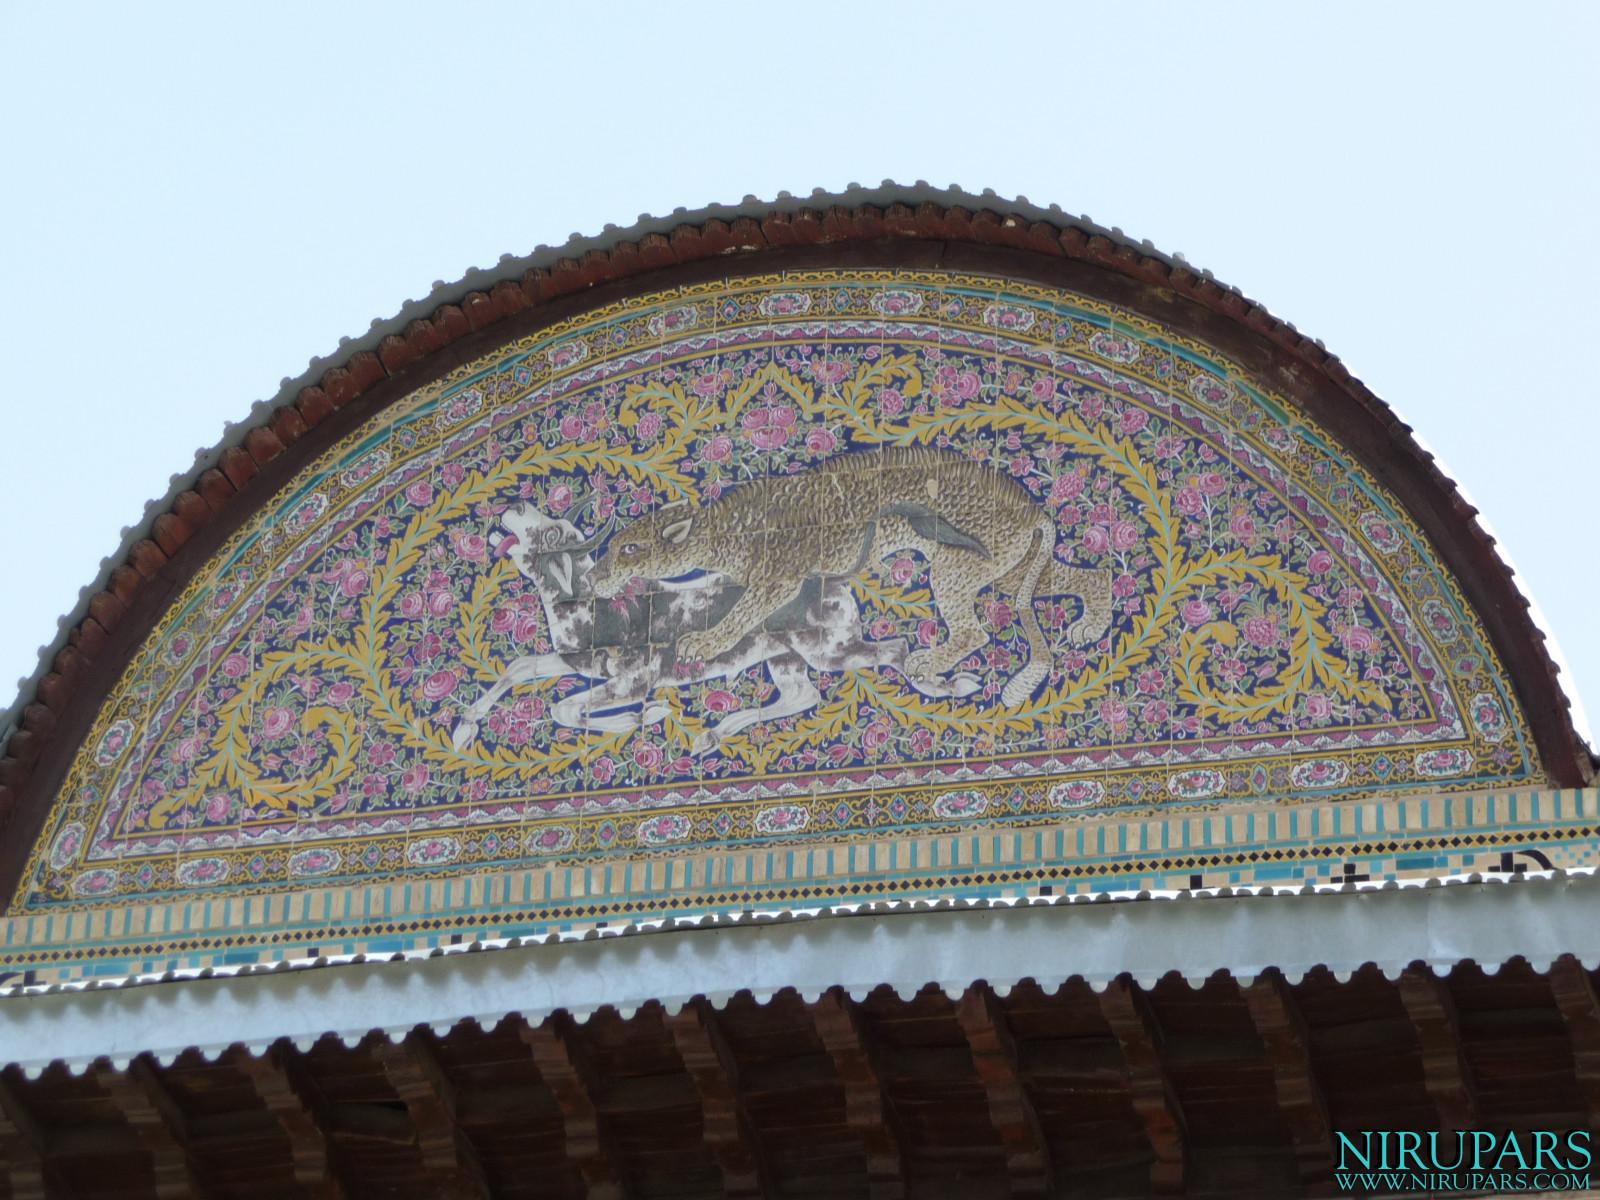 Naranjestan-e Qavam - Pediment Painting Lion Bull